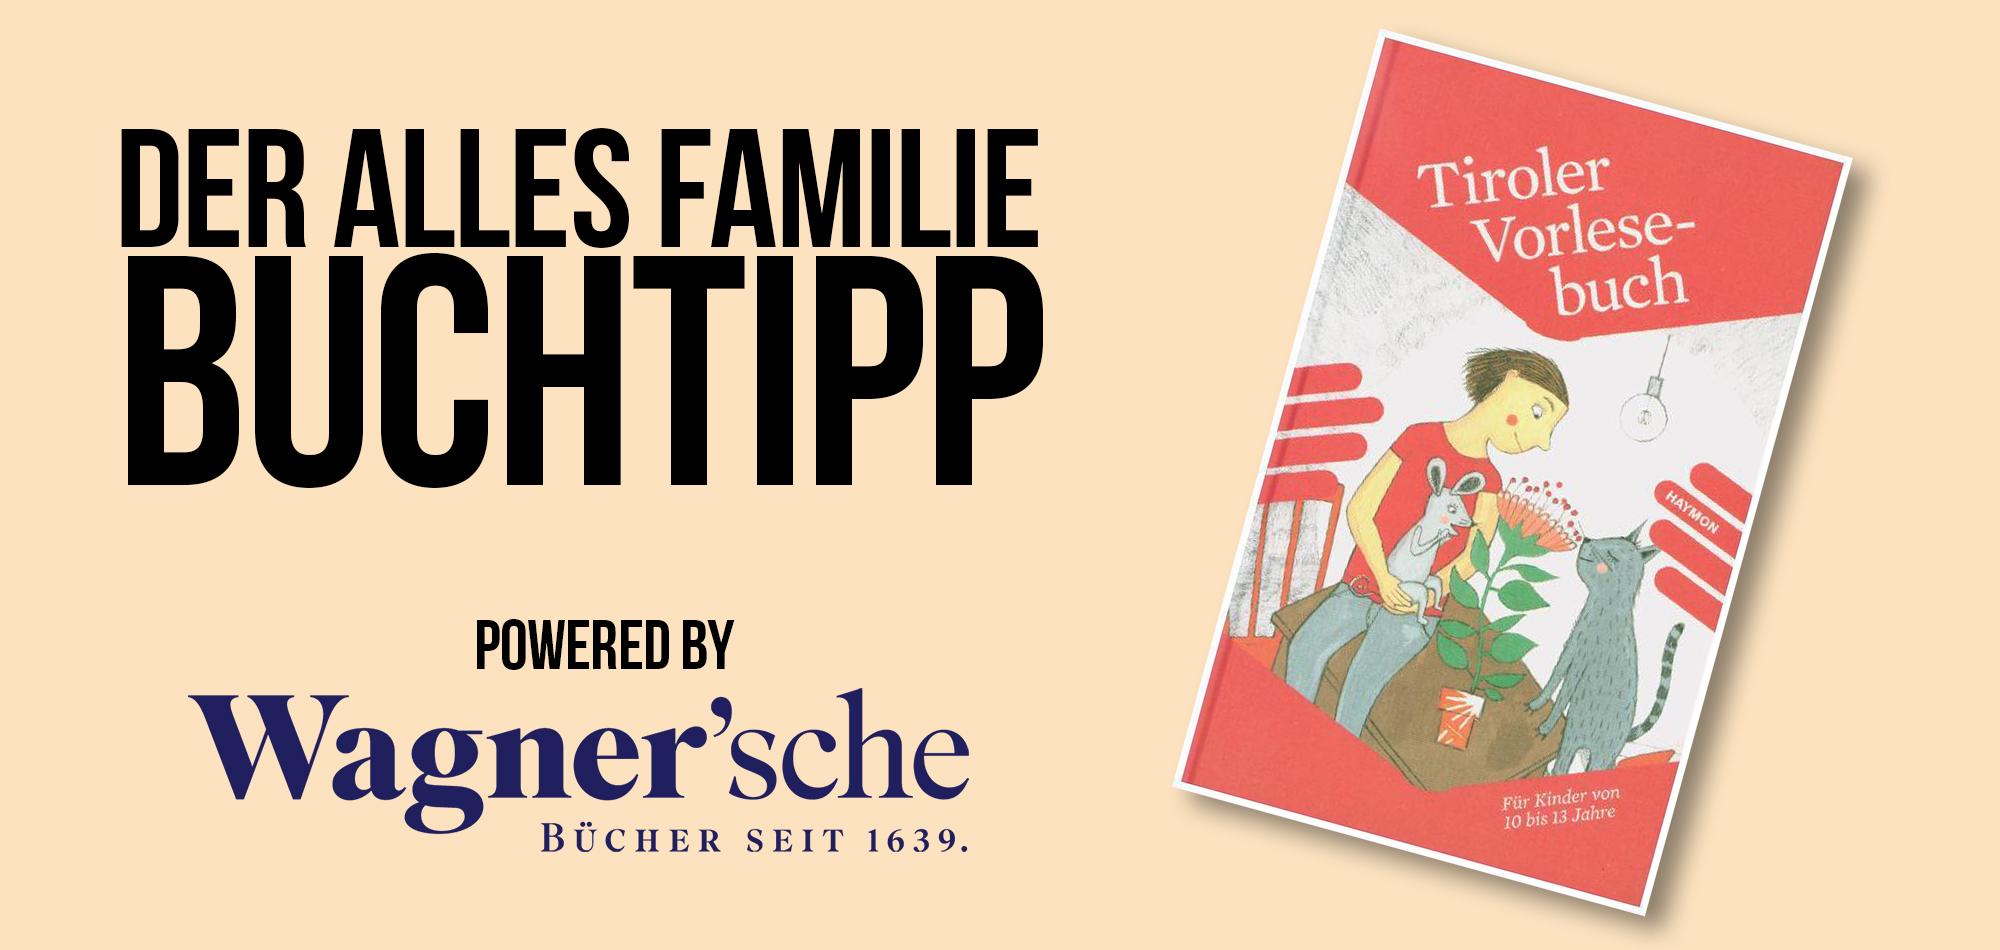 Das Tiroler Vorlesebuch Band 3